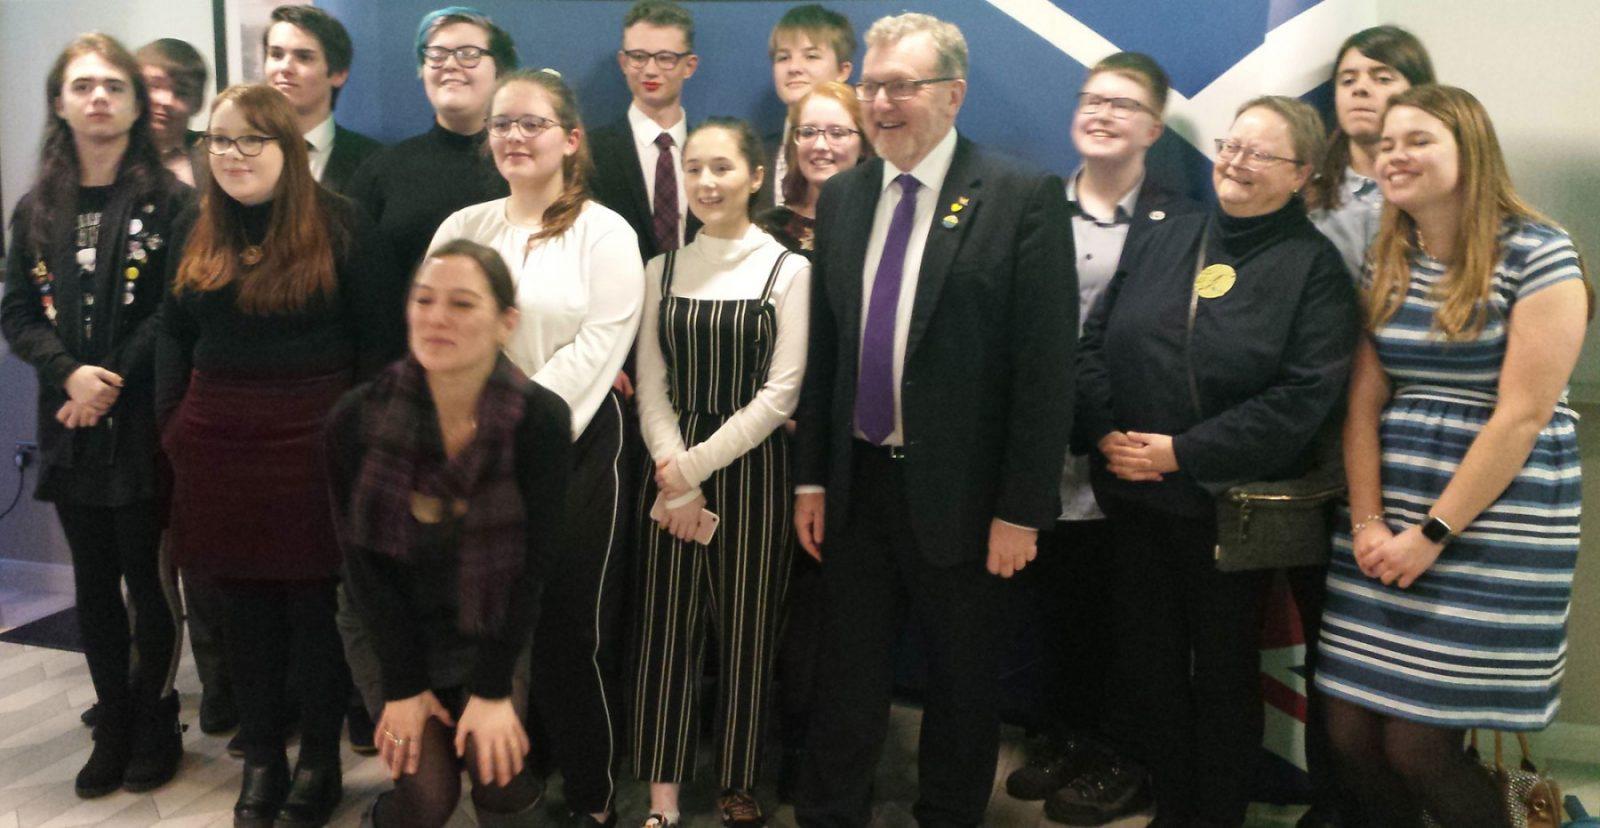 Group image, Edinburgh Scottish Office event